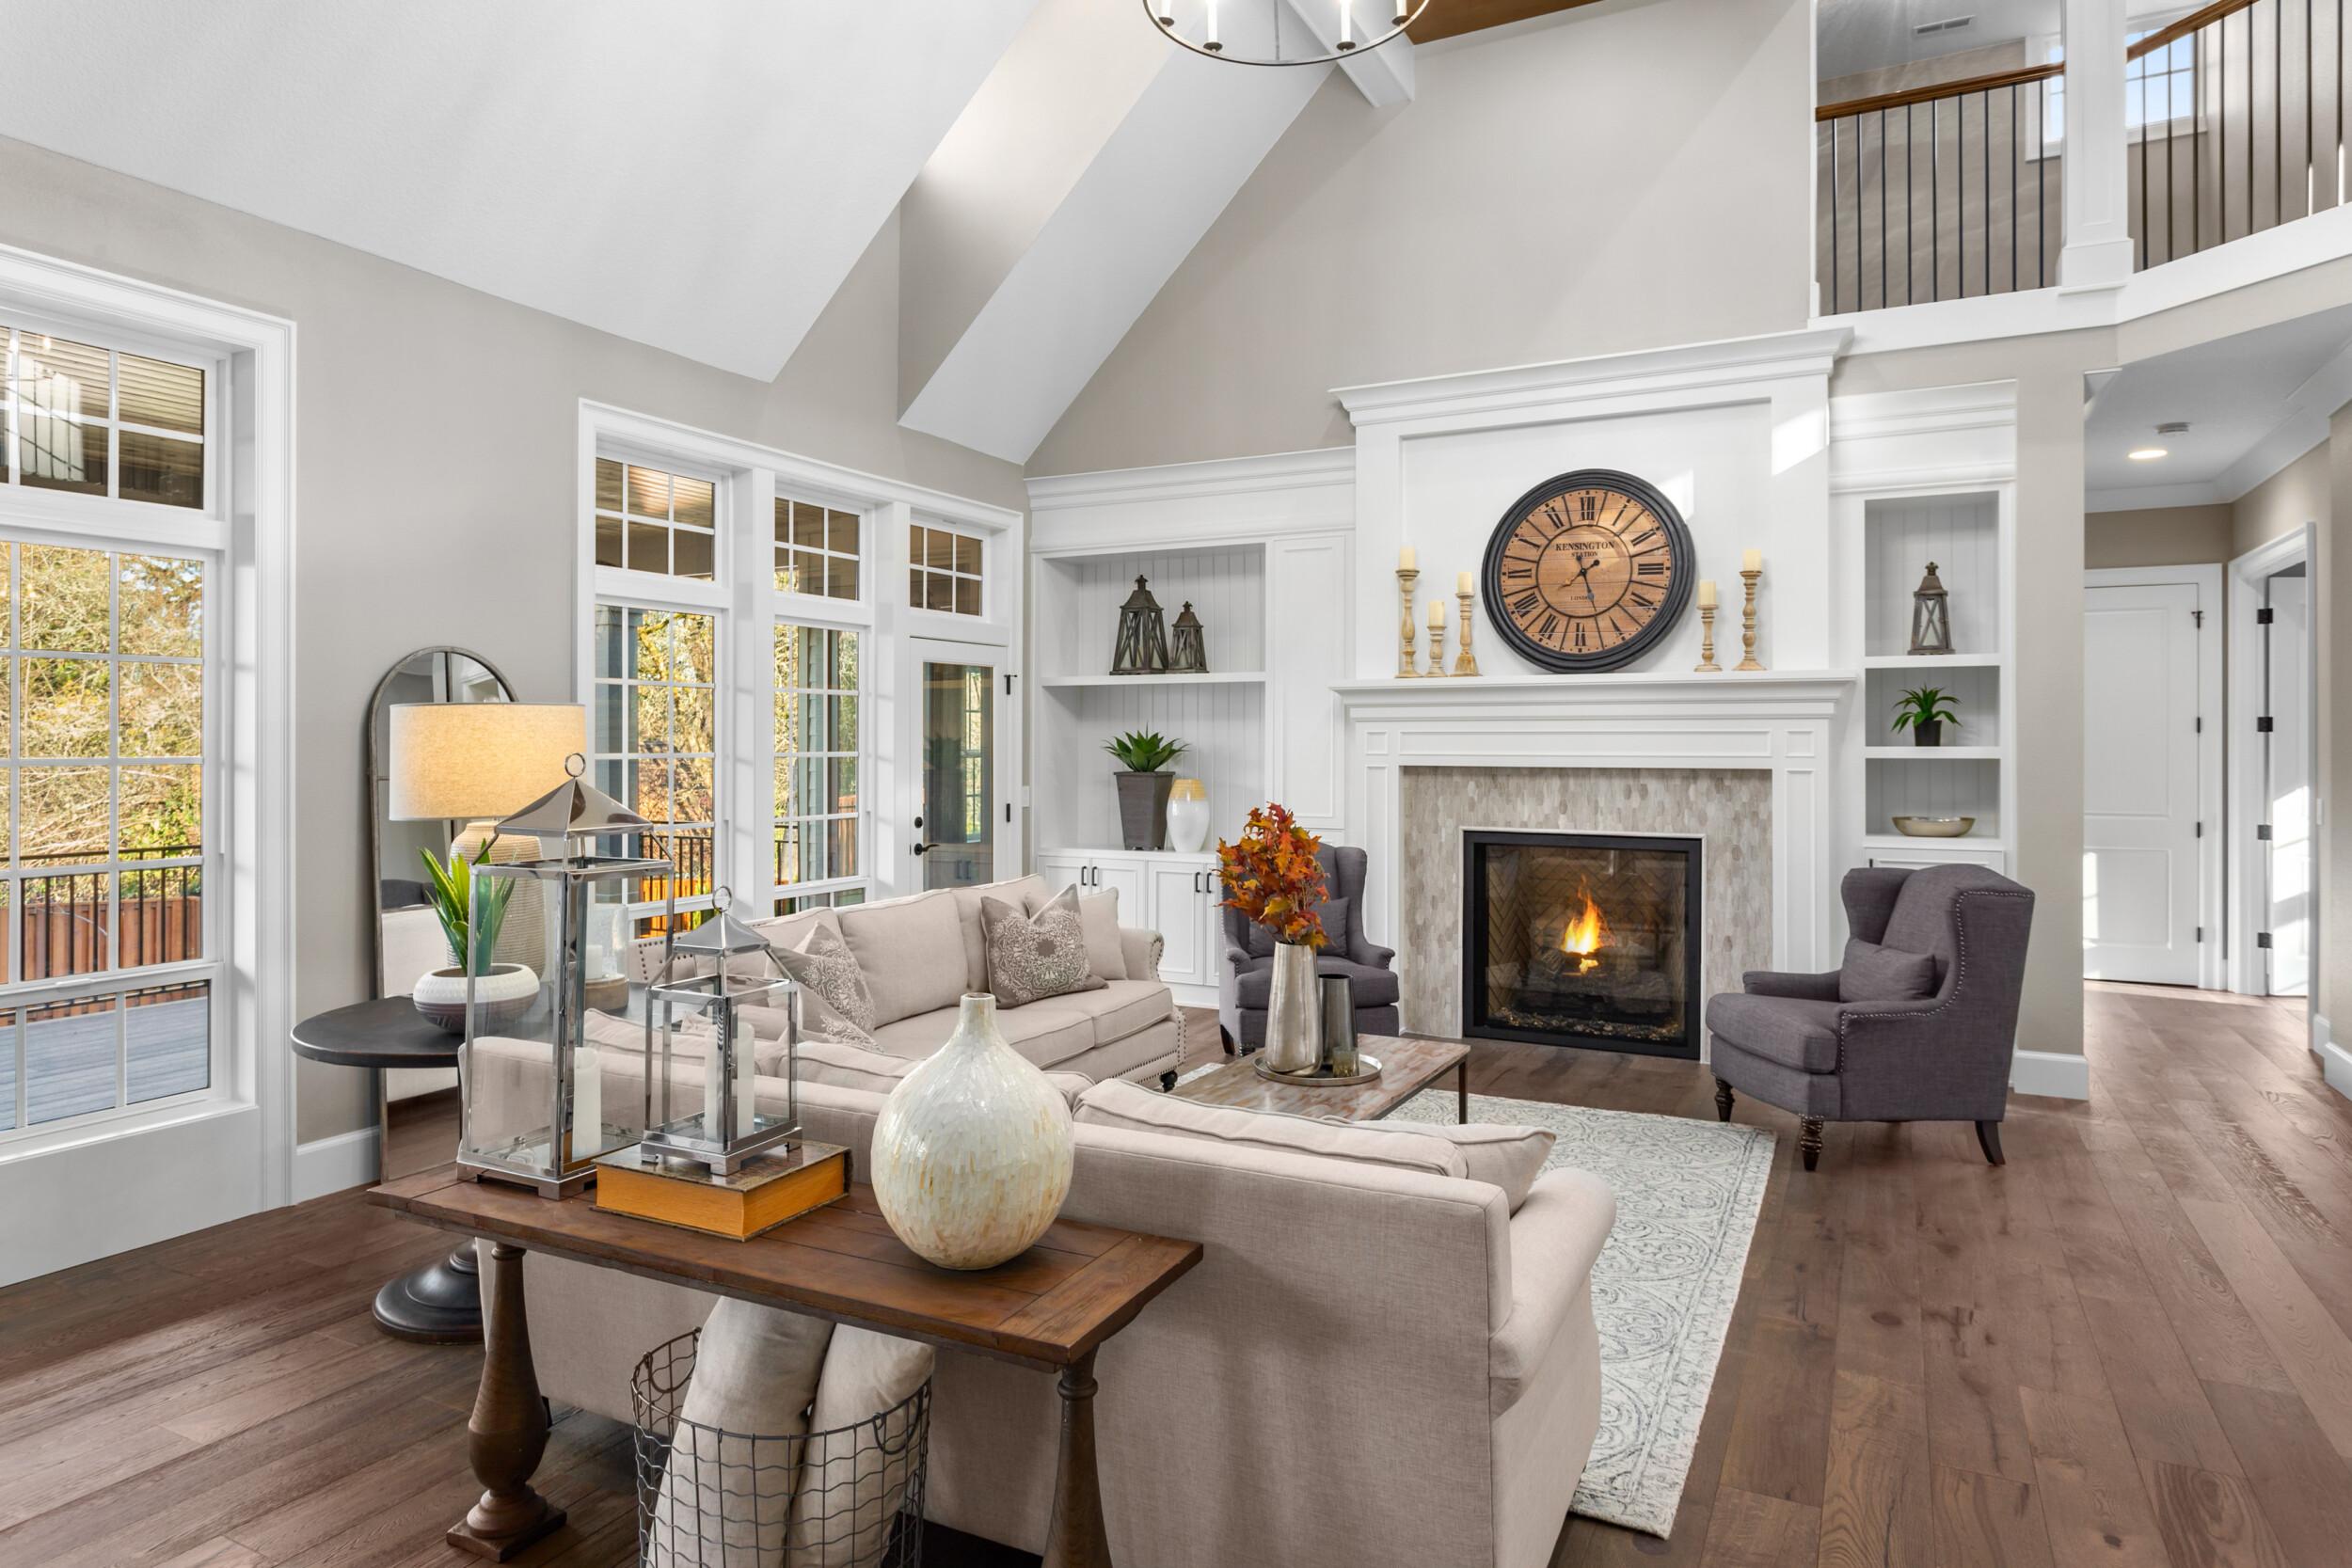 luxurious traditional interior design